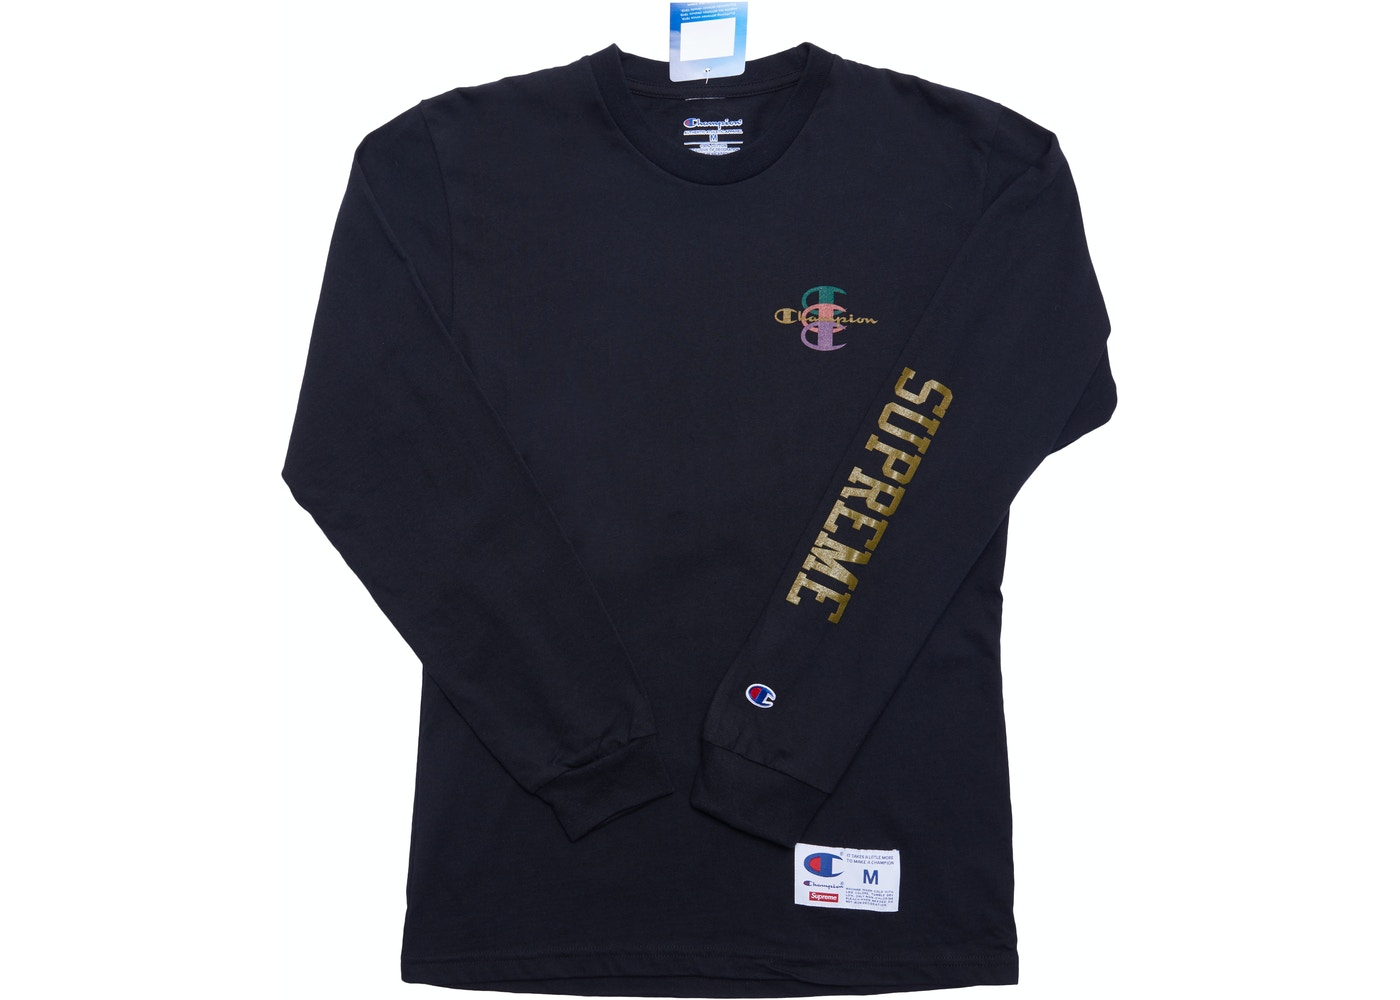 834619f5 Supreme Champion Stacked C L/S Tee Black - FW17